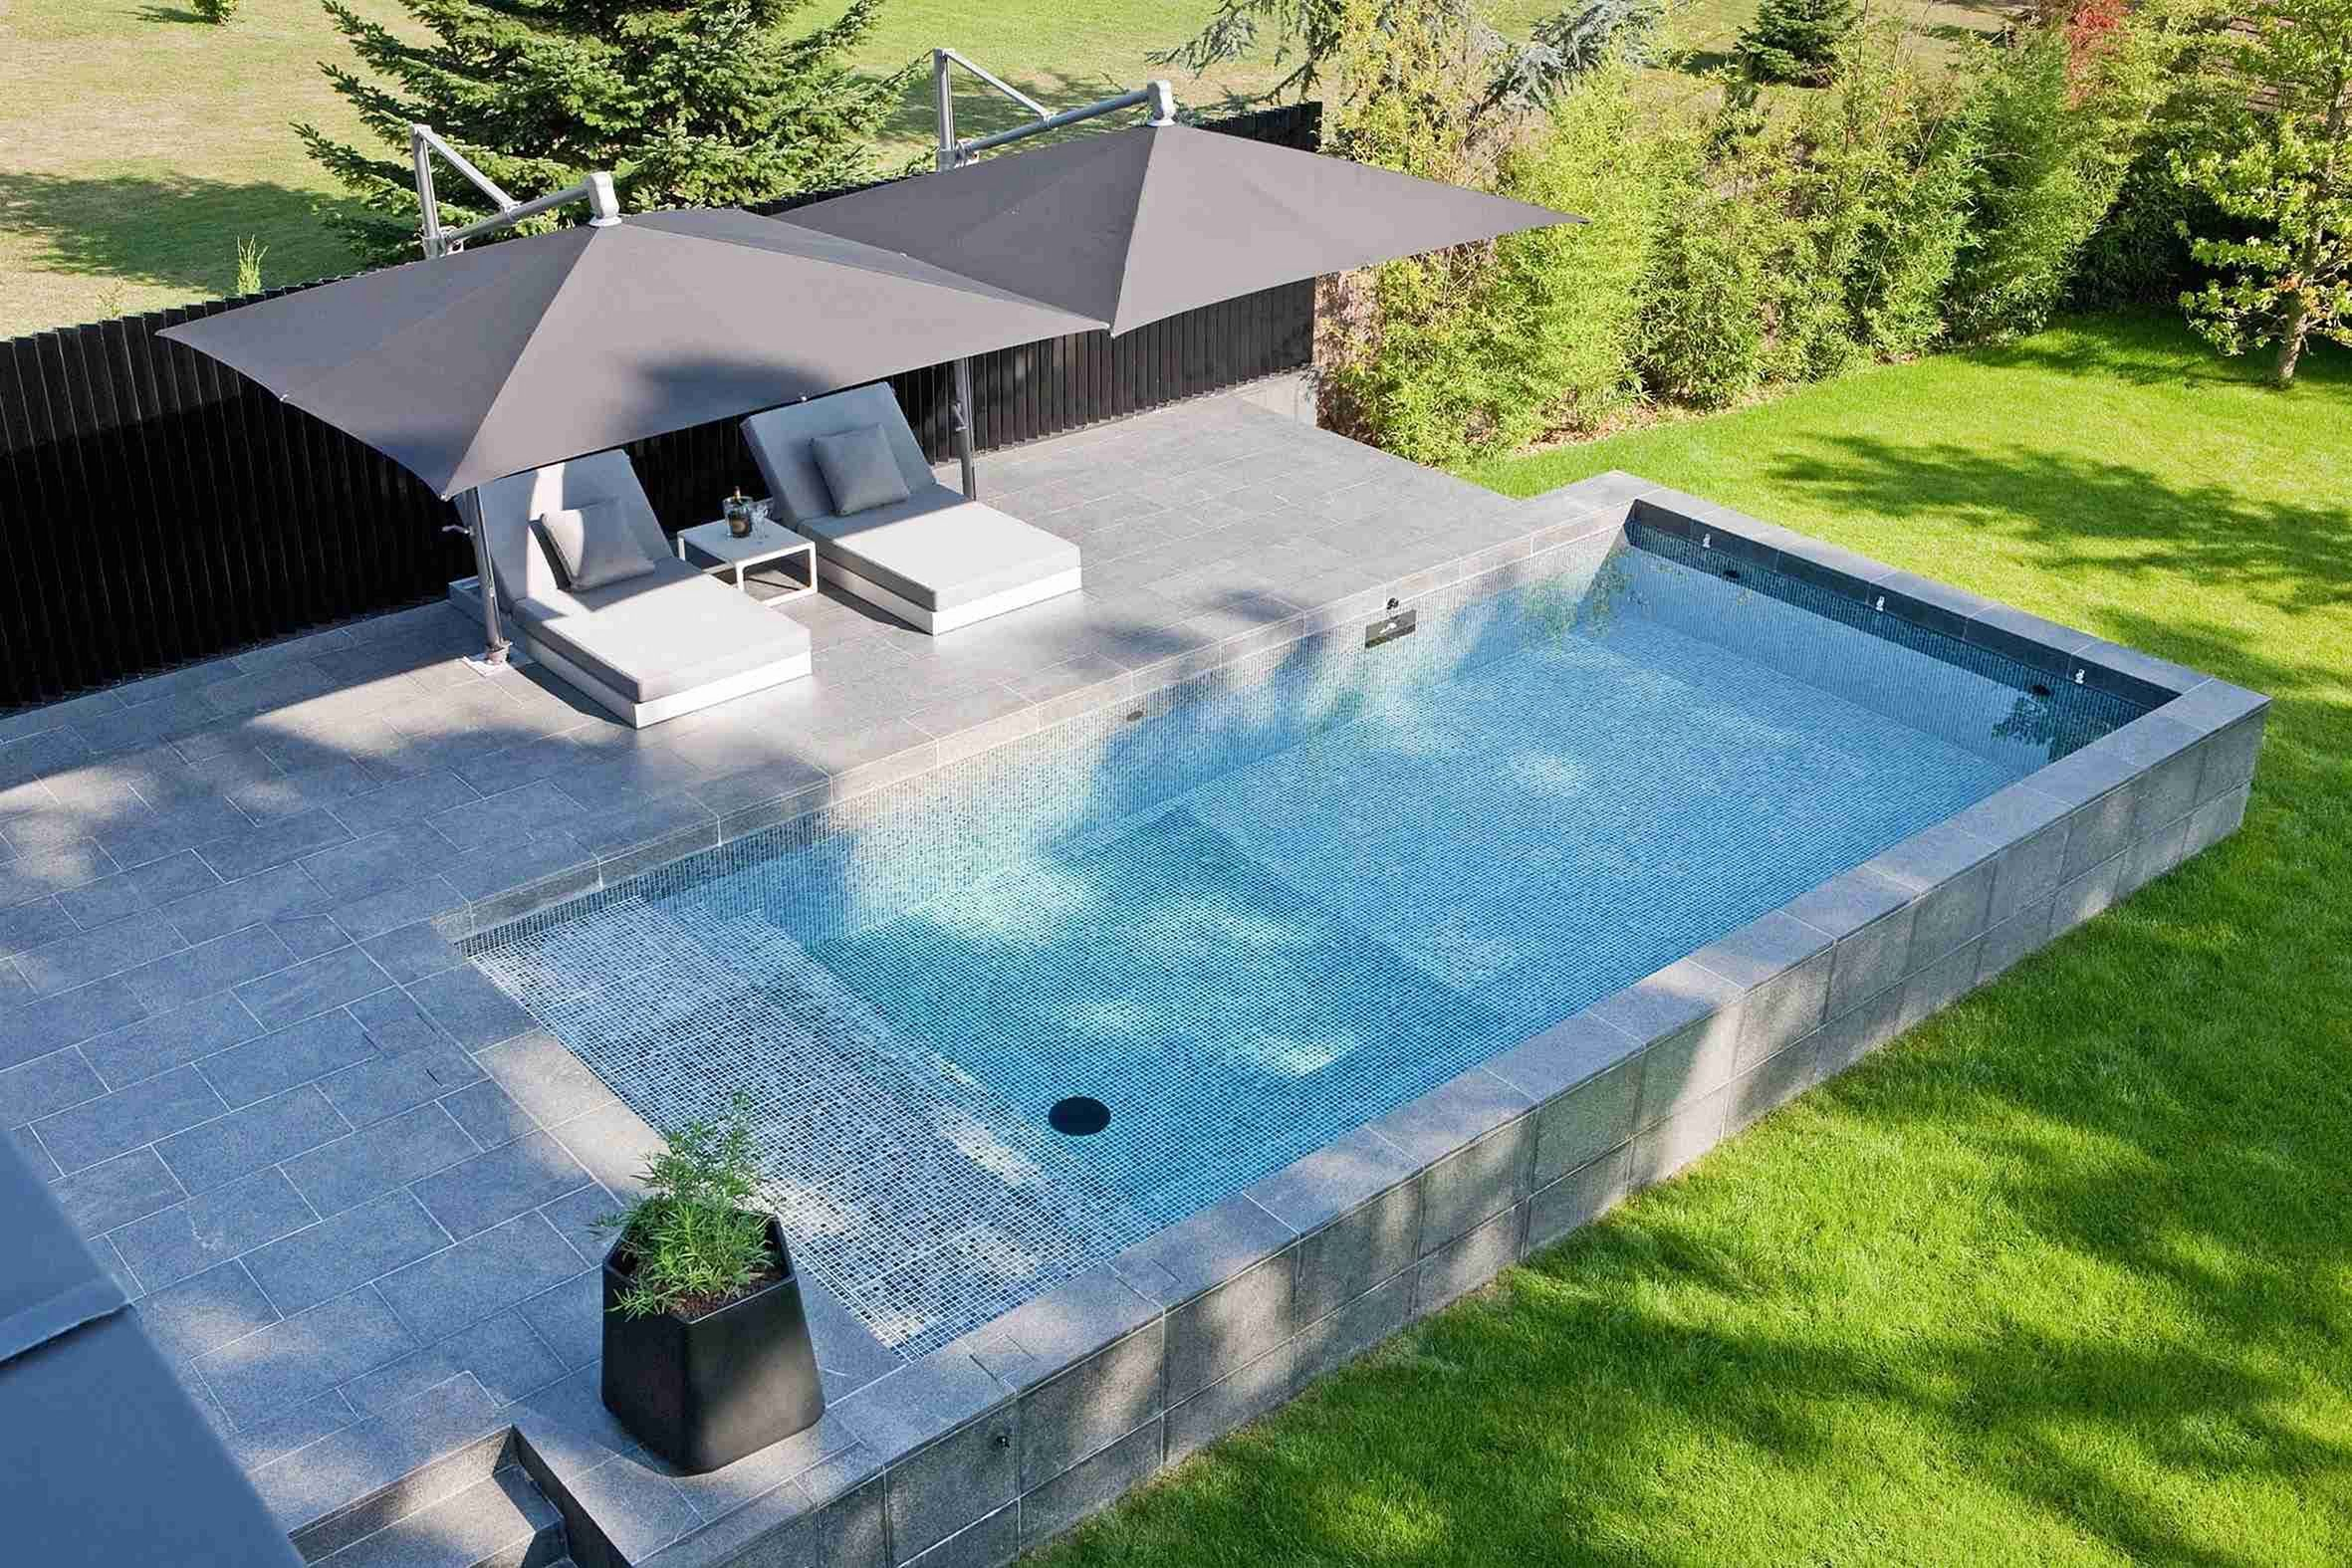 Astonishing Simple Swimming Pool Design Ideas For Small Backyard